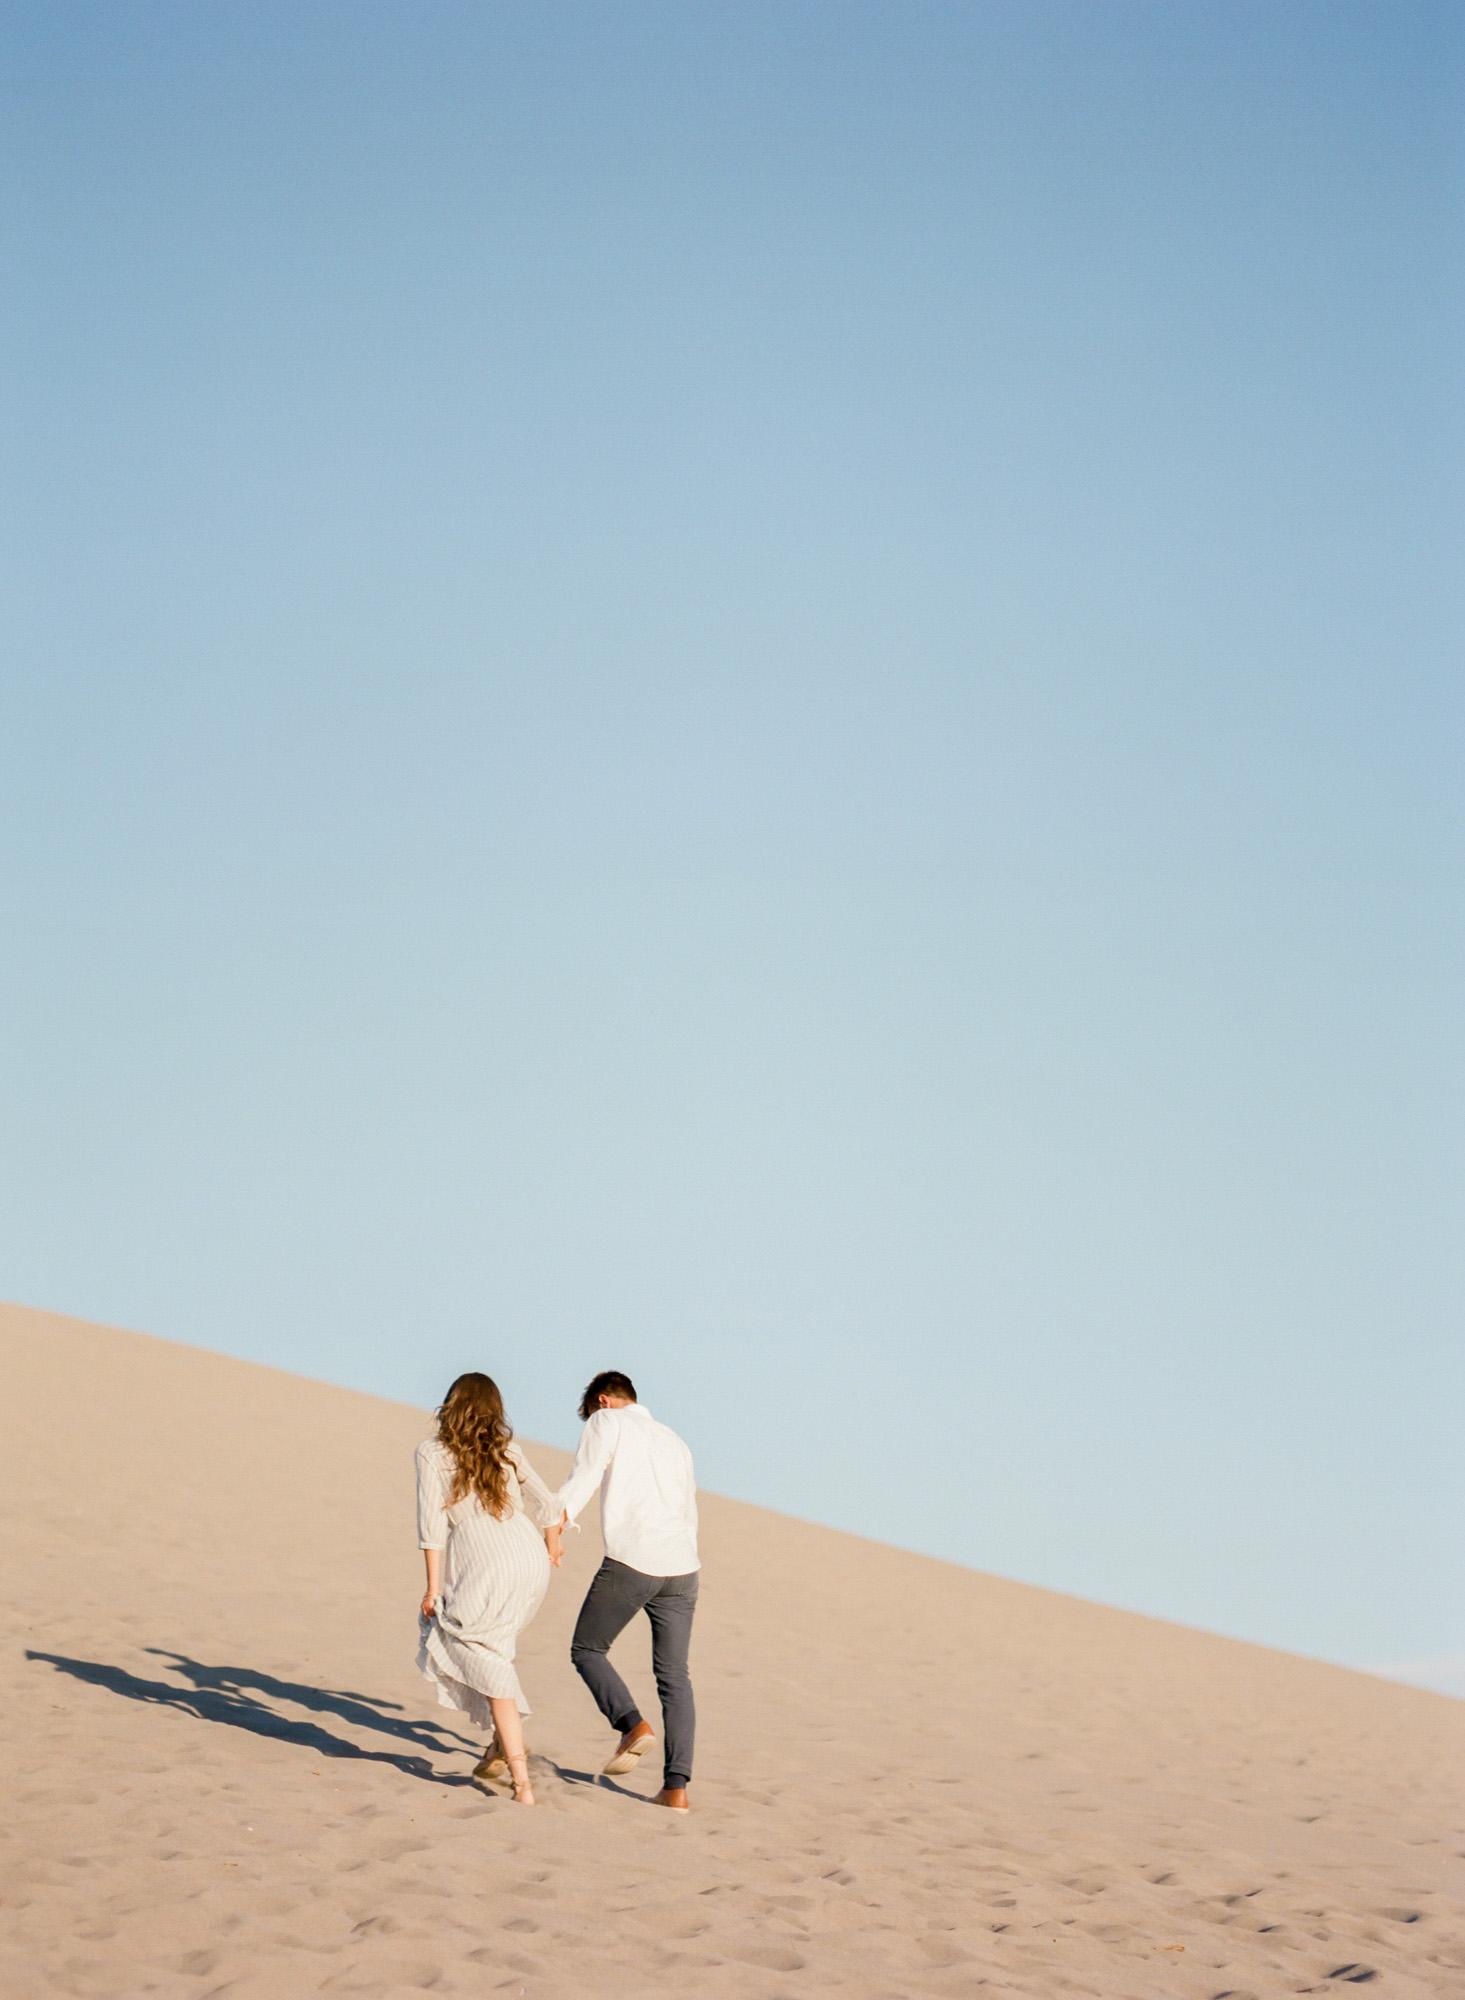 boise-idaho-film-wedding-photographer-14.jpg